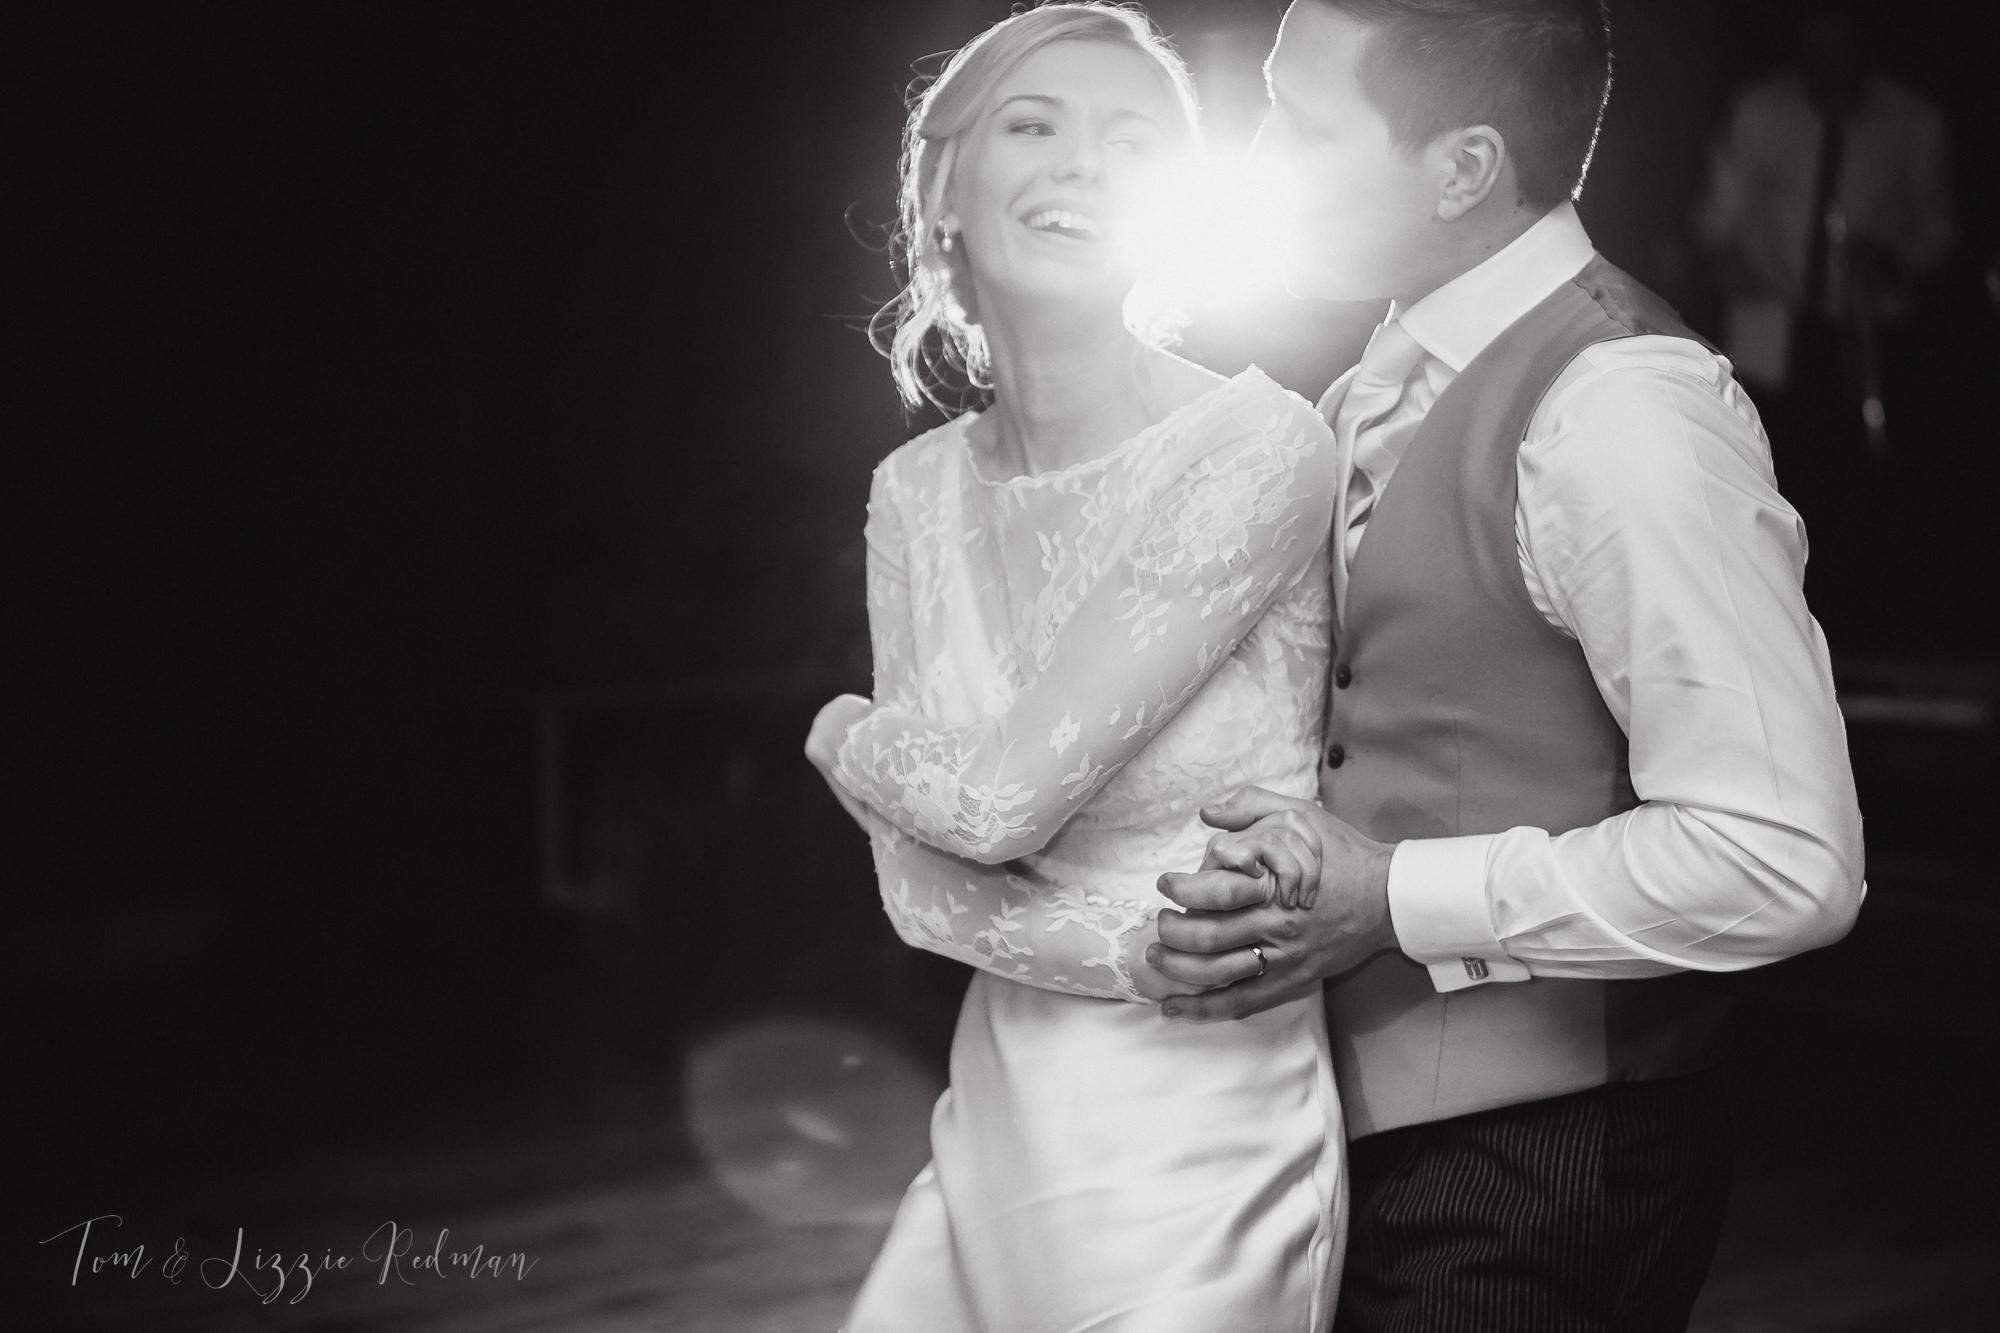 Dorset wedding photographers Tom & Lizzie Redman 073.jpg